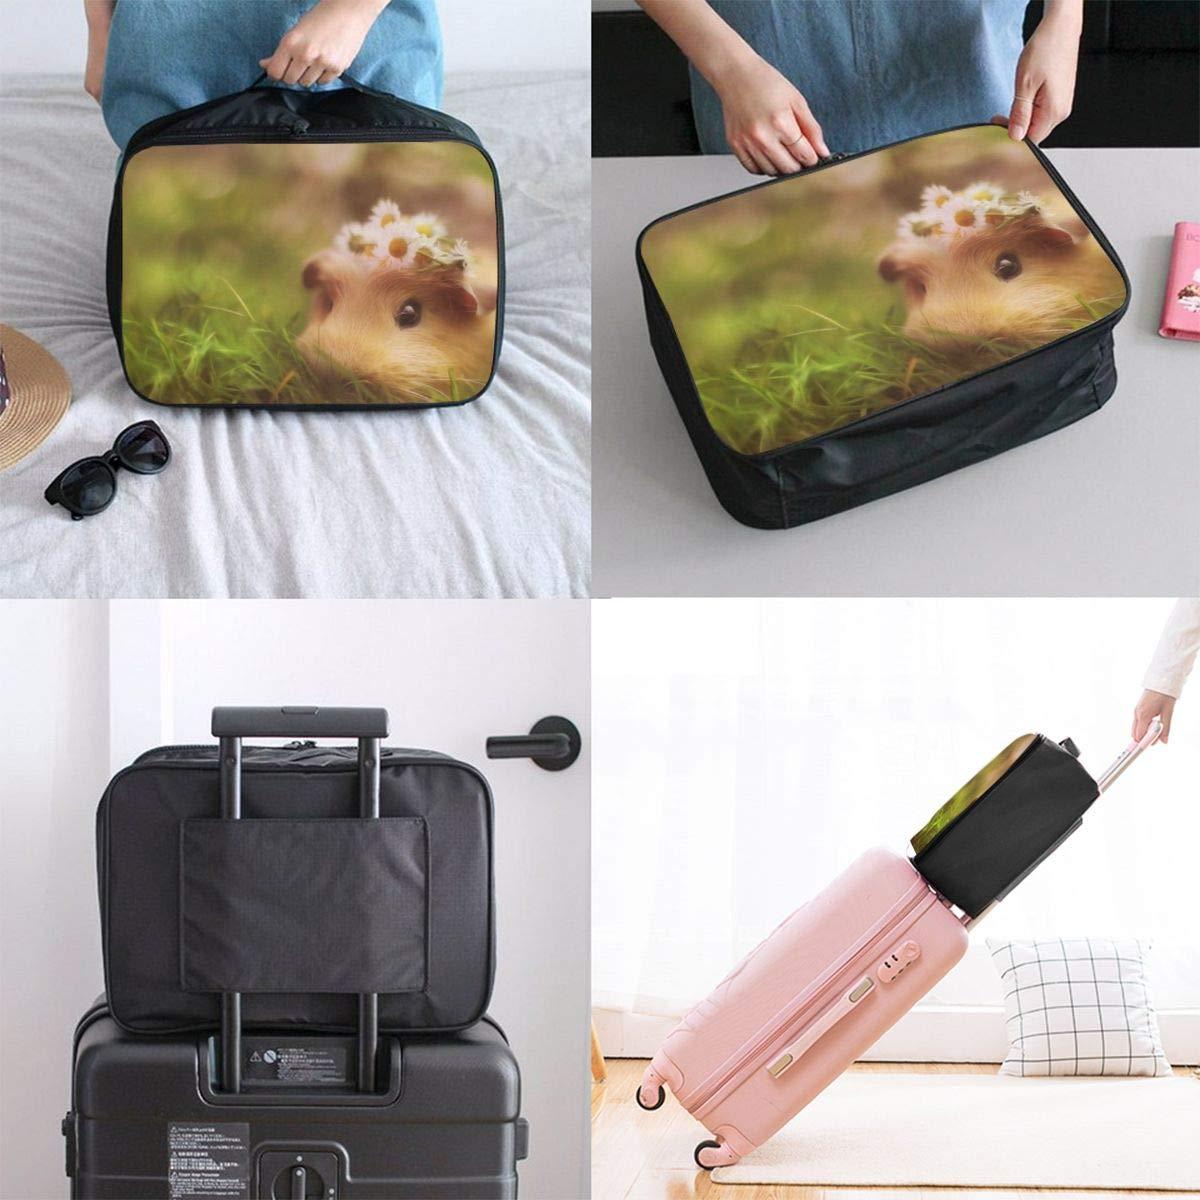 Travel Luggage Duffle Bag Lightweight Portable Handbag Cute Guinea Pig Large Capacity Waterproof Foldable Storage Tote